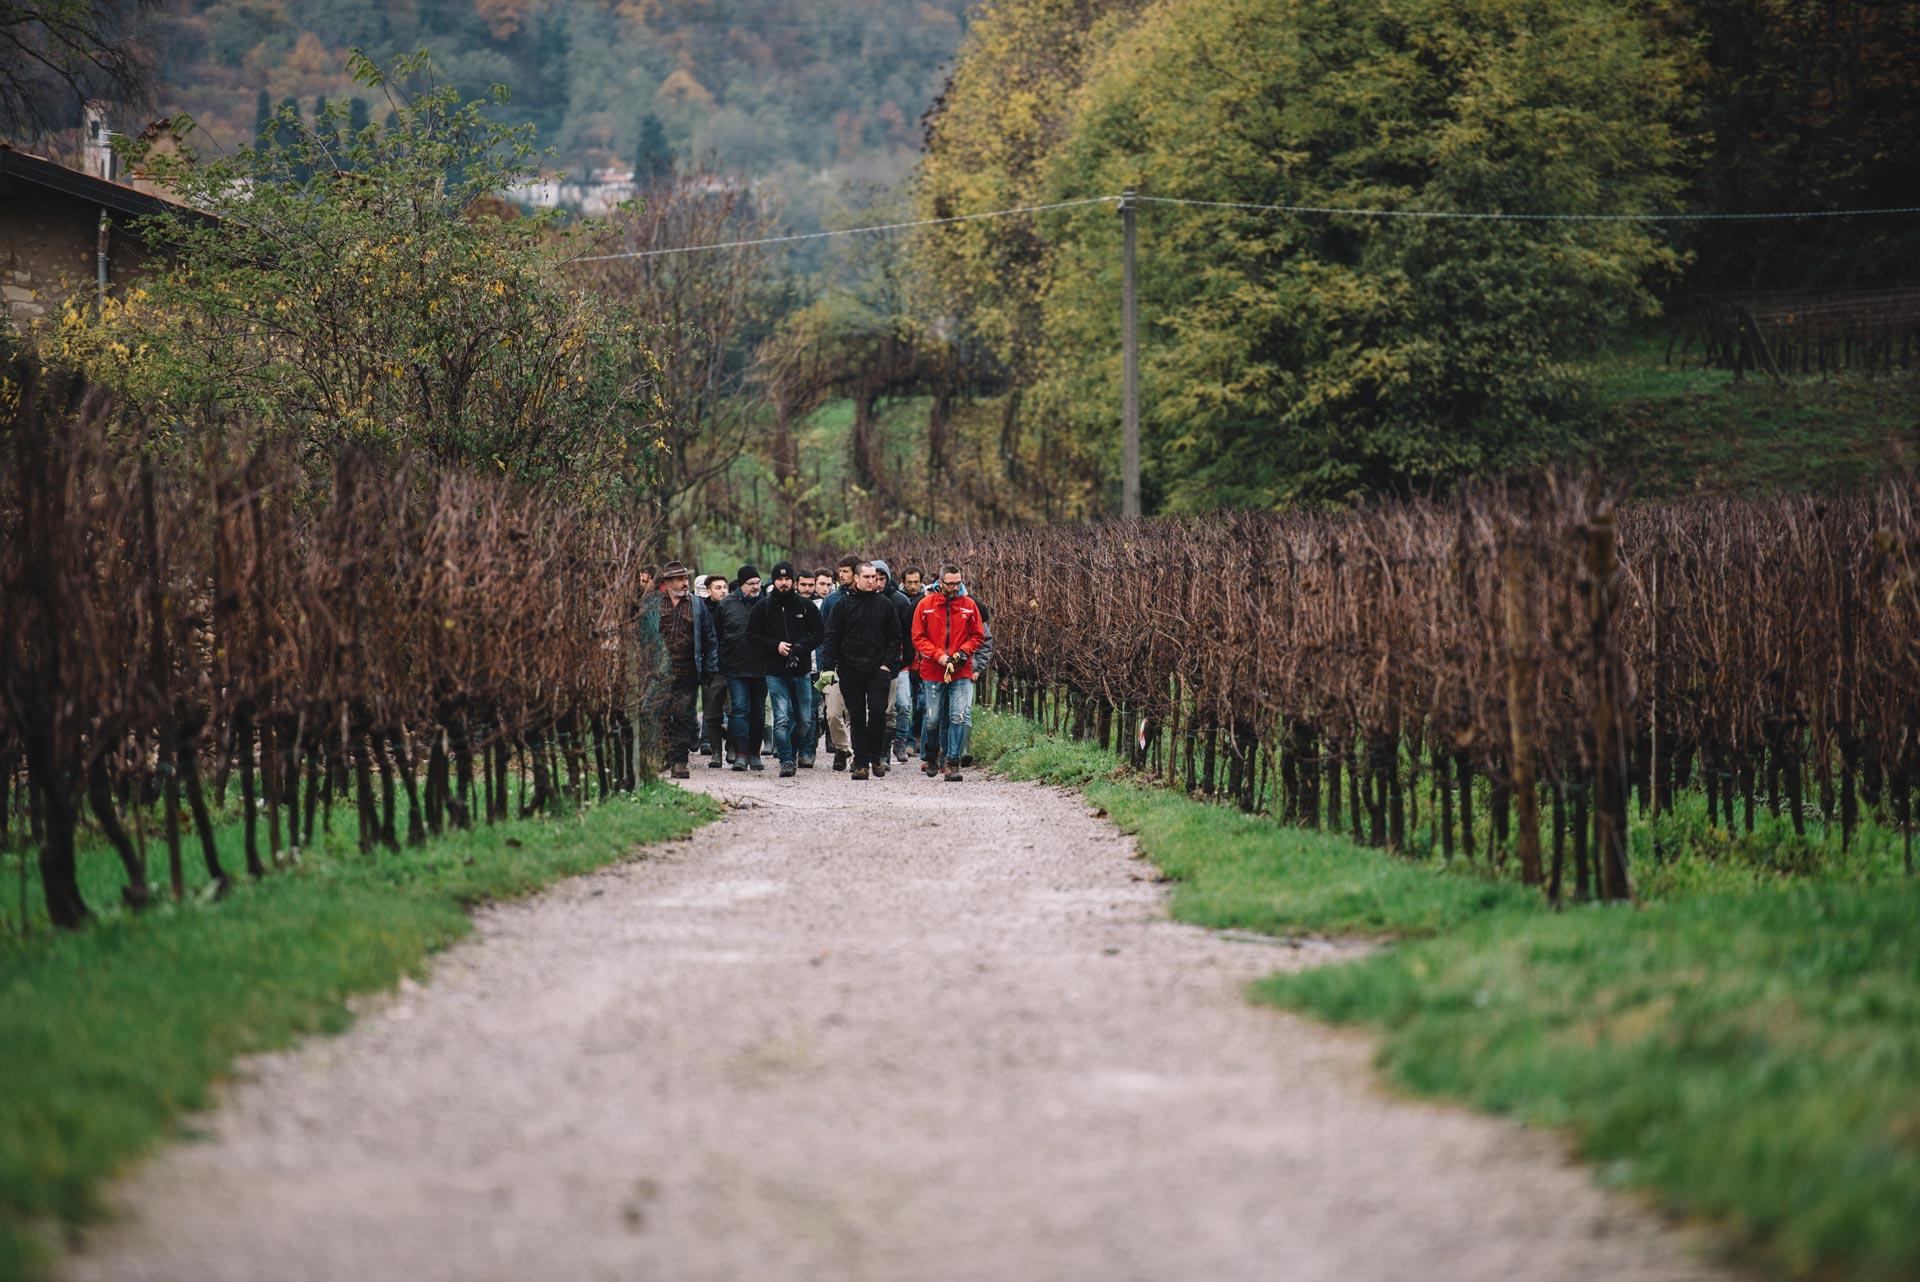 école 2016/17 | Bellavista | Franciacorta | Lombardia